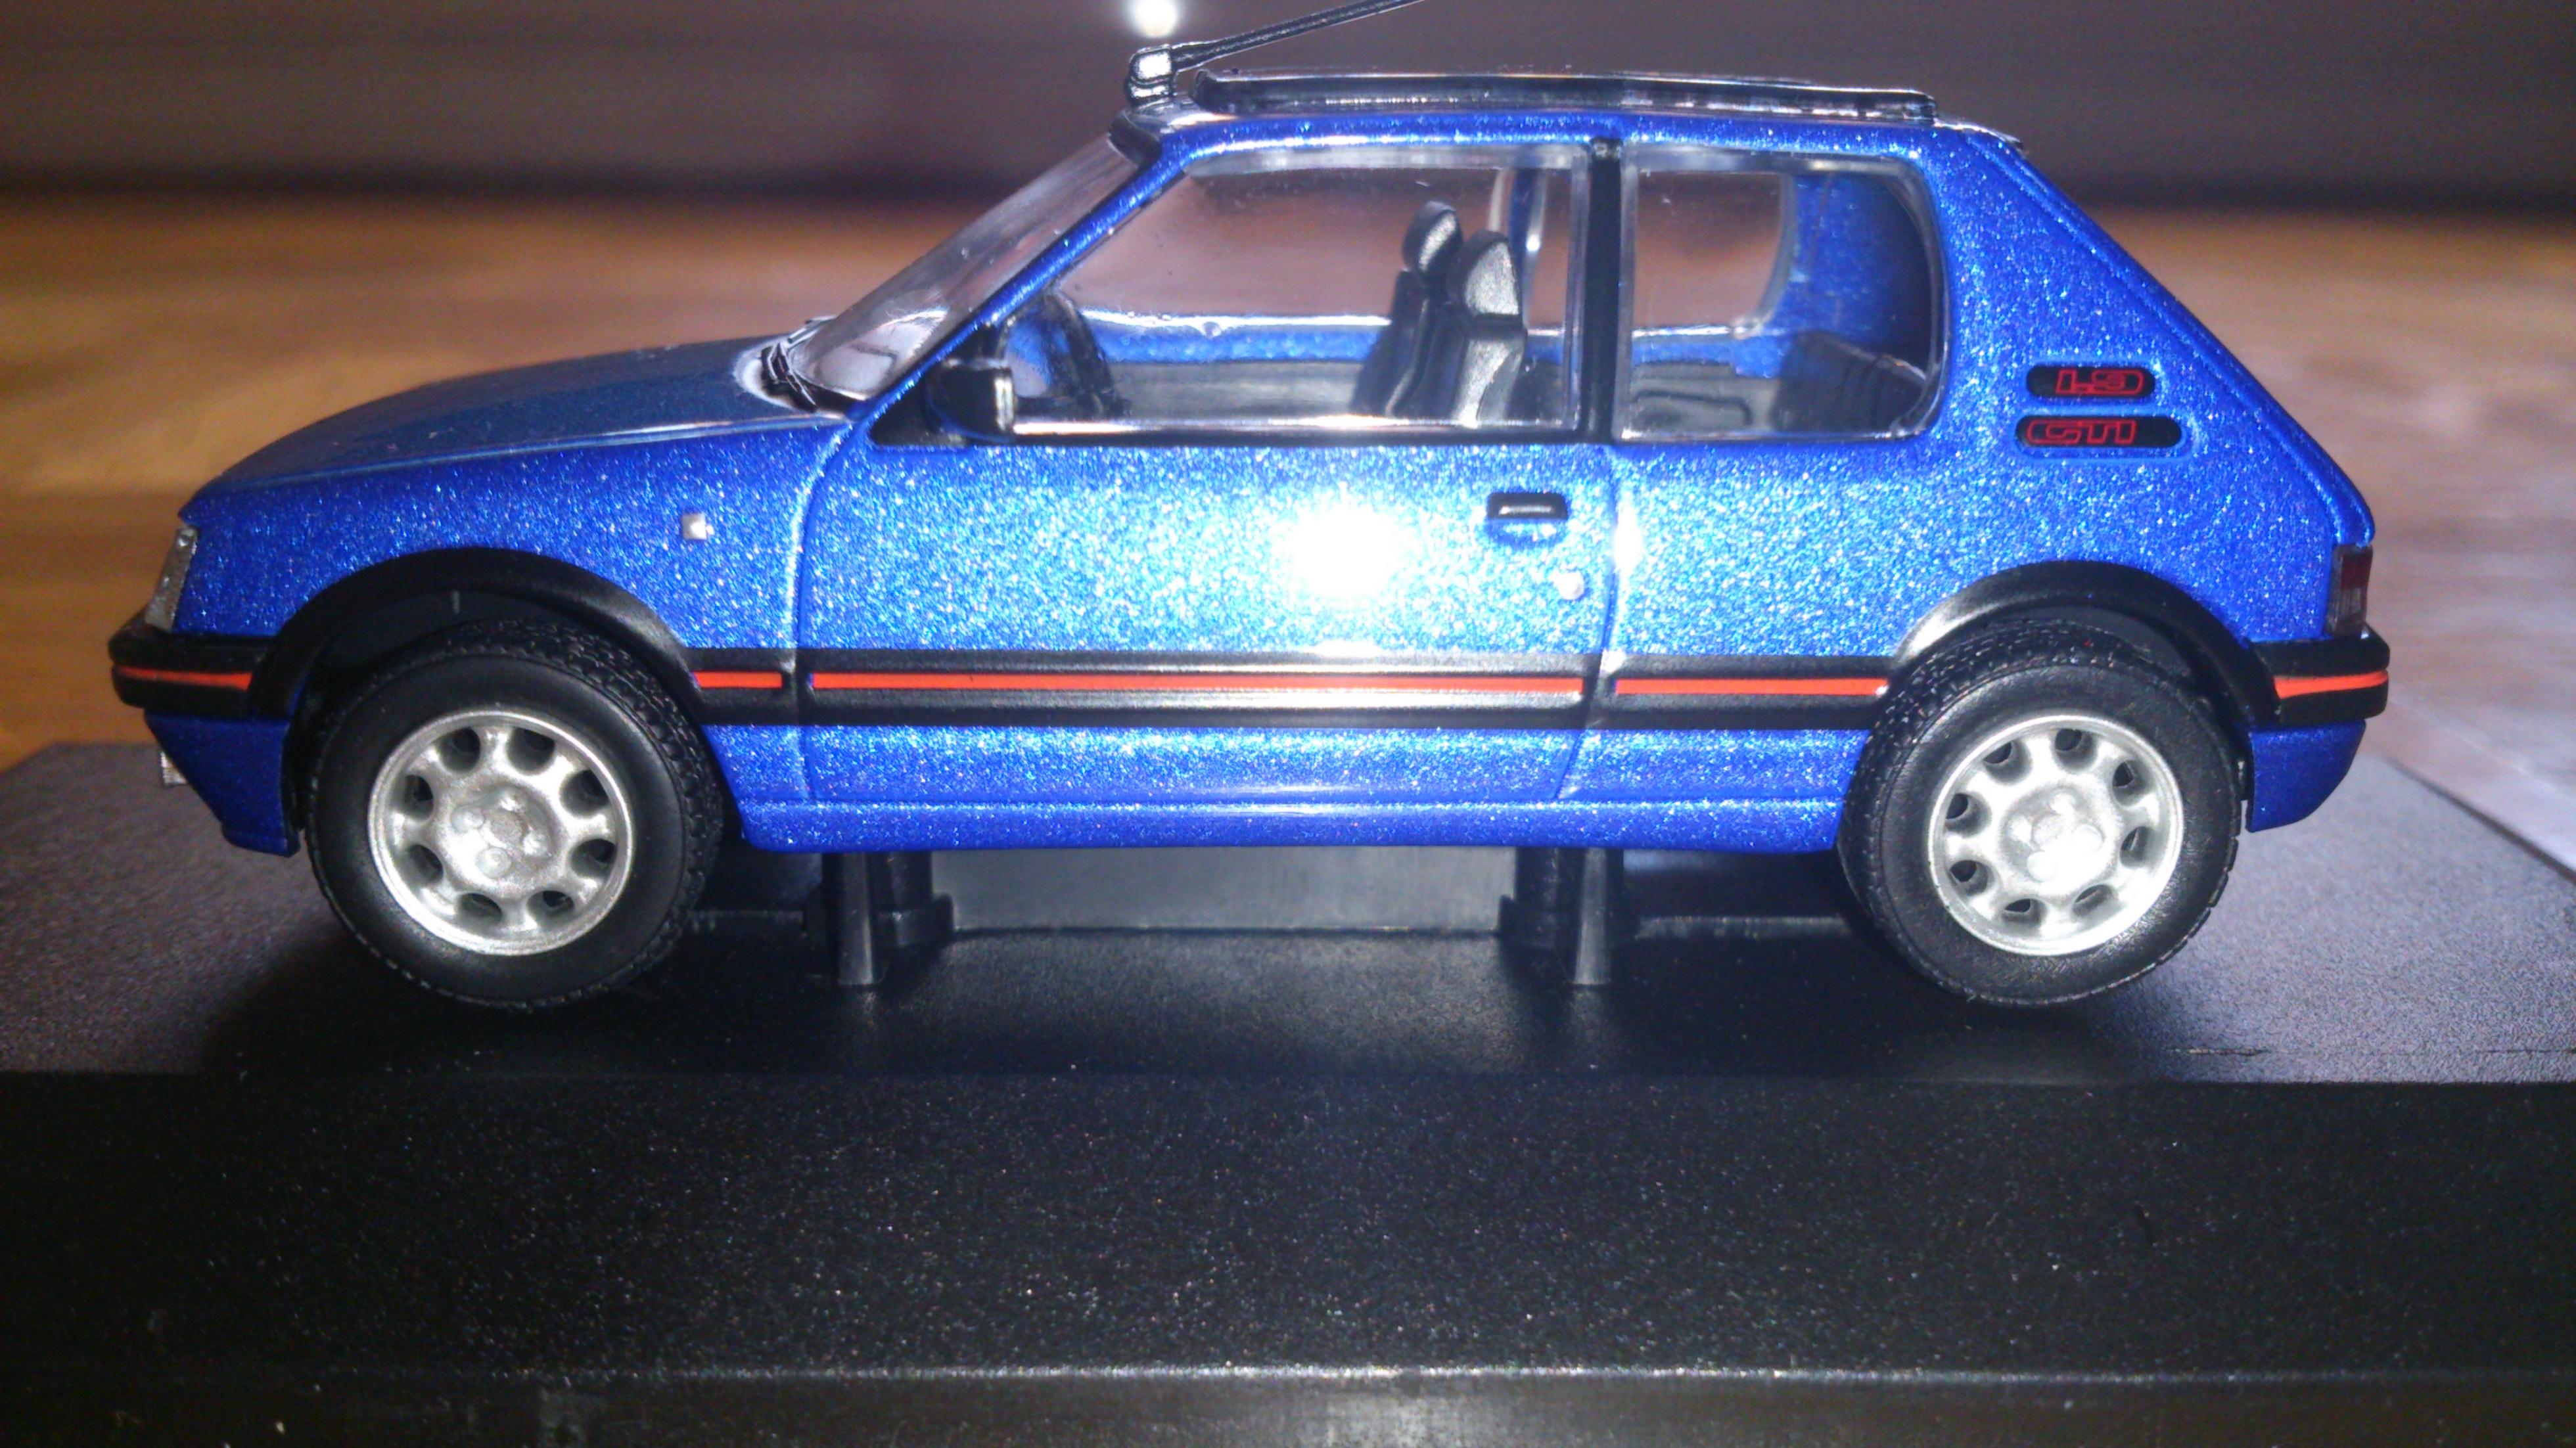 Peugeot_205_gti_1.9_2